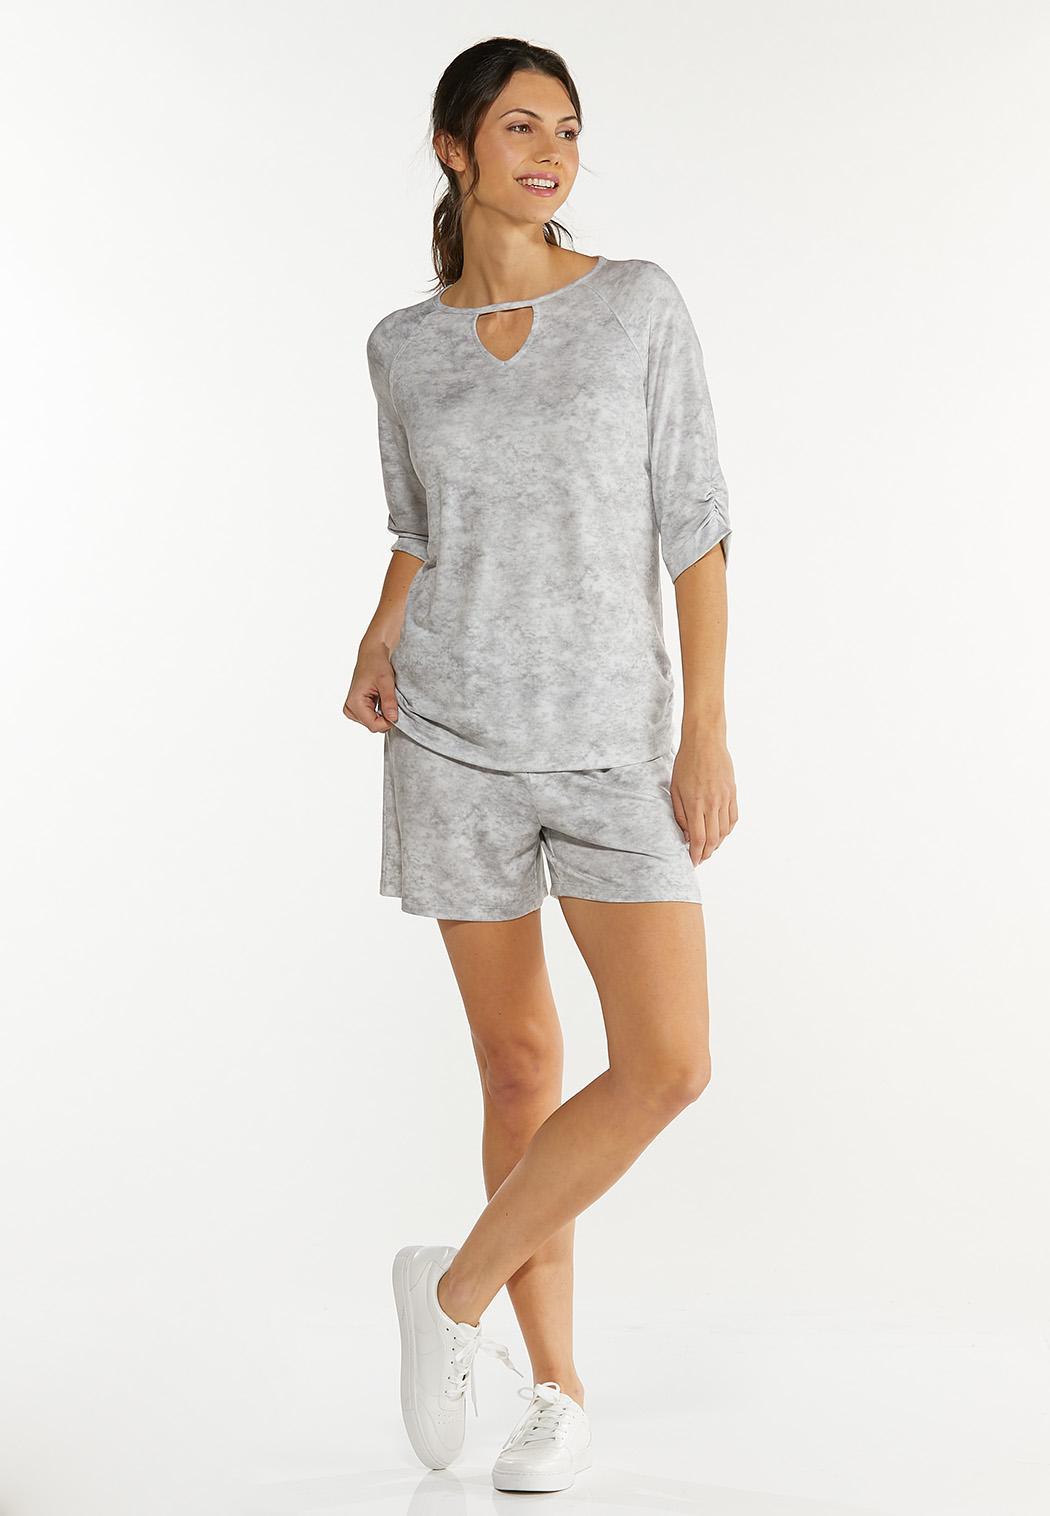 Plus Size Gray Tie Dye Top (Item #44577527)